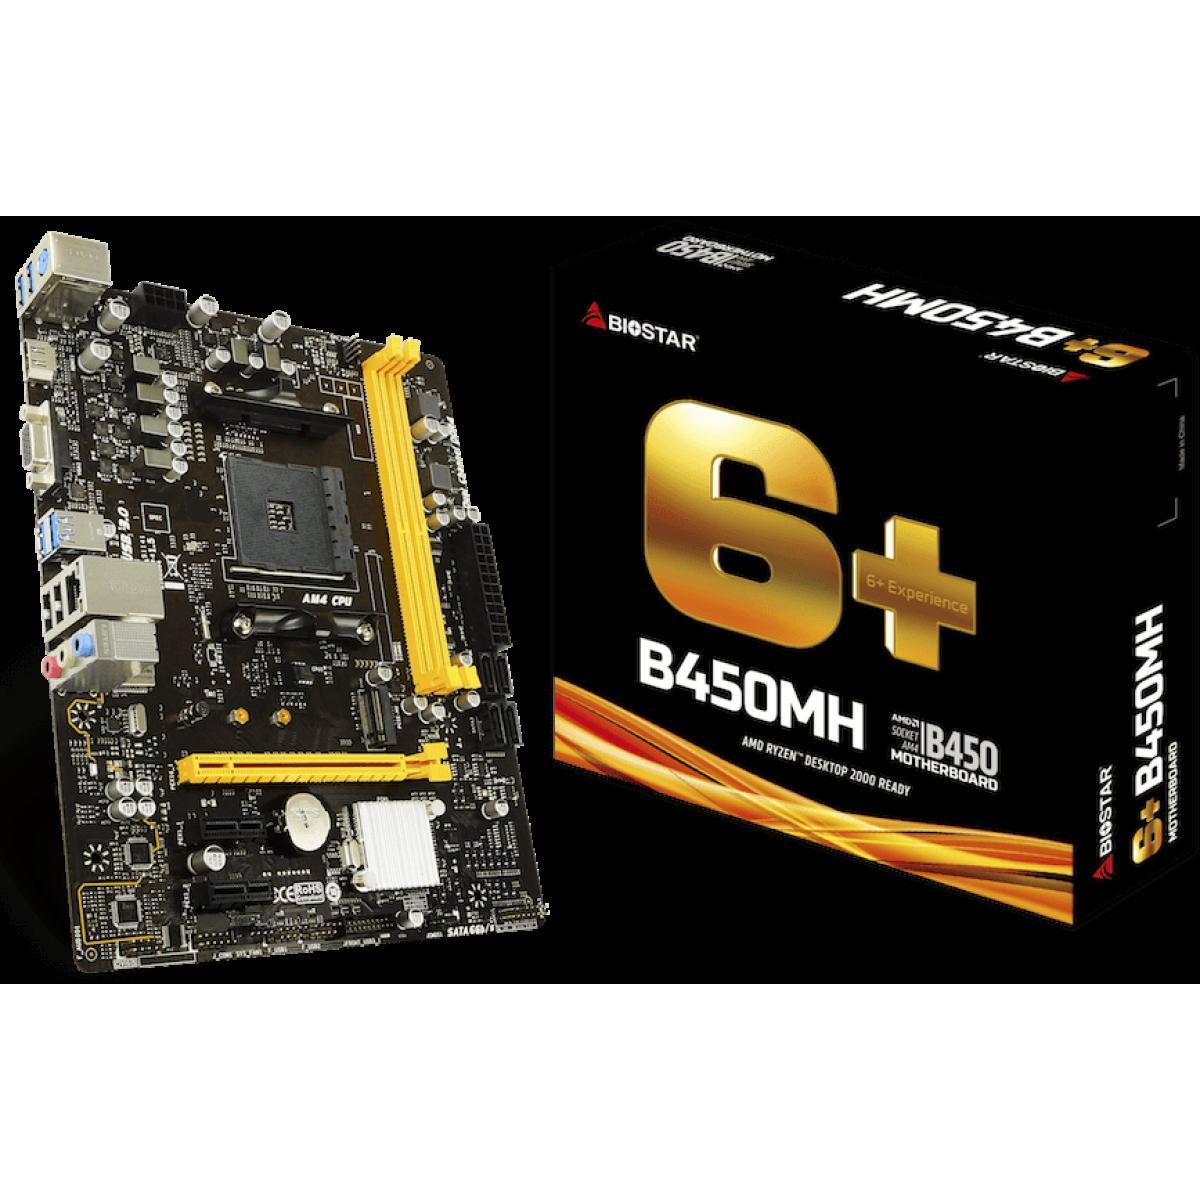 Placa Mãe Biostar B450MH, Chipset B450, AMD AM4, mATX, DDR4